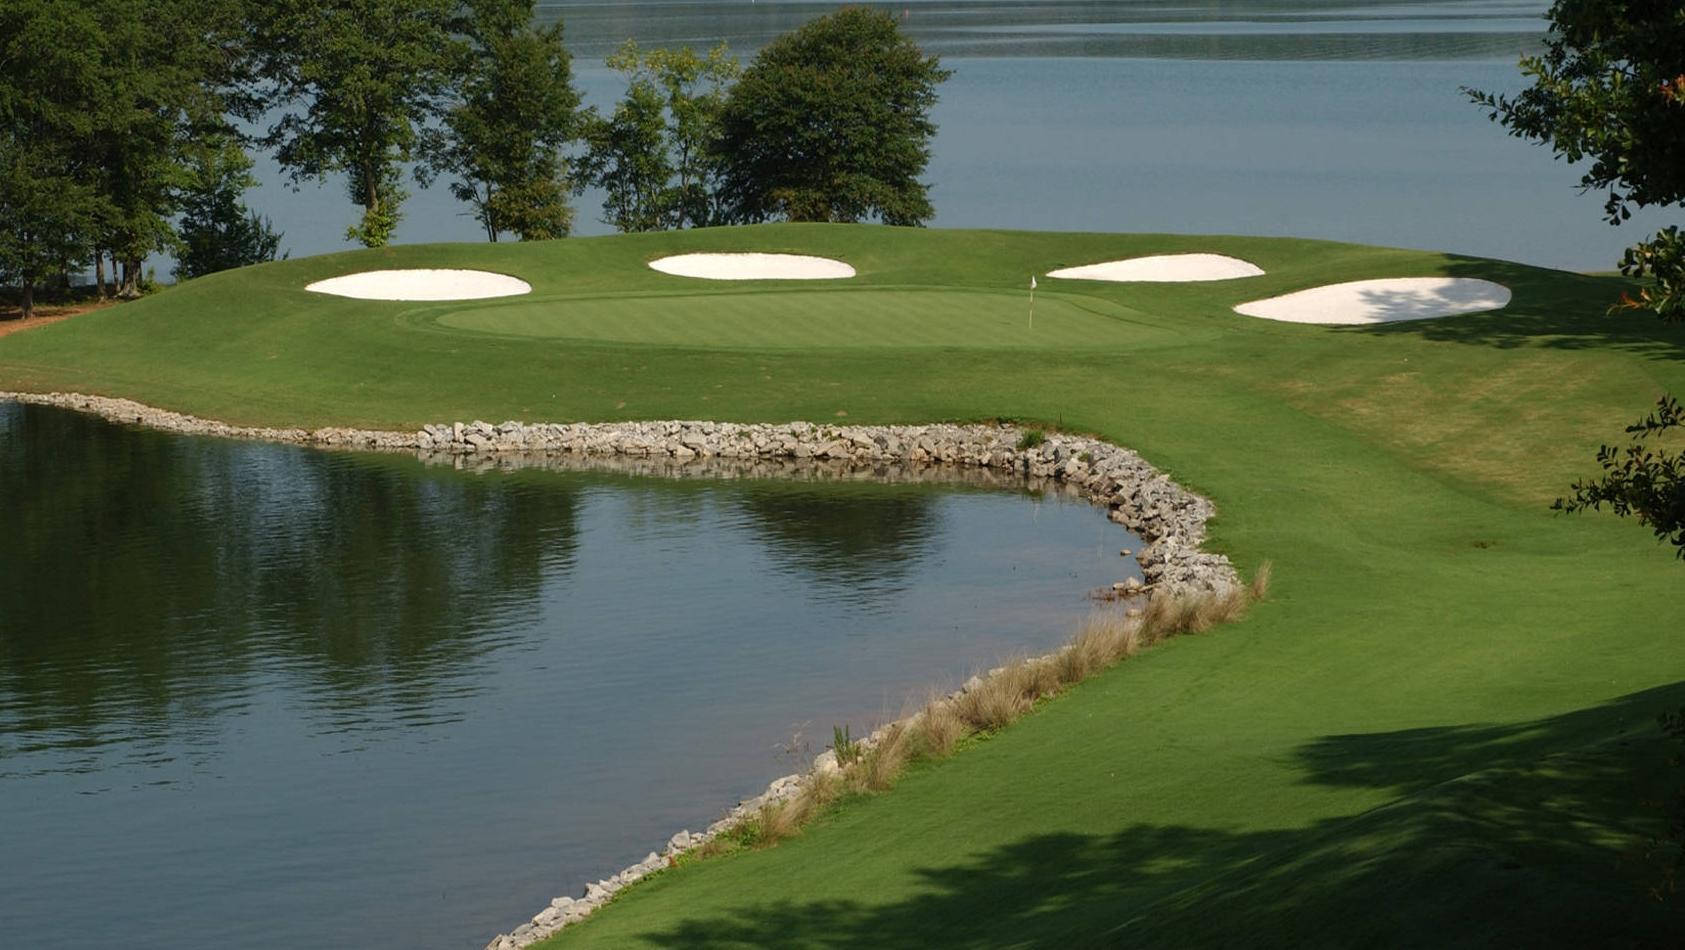 Clemson Announces 2013-14 Men's Golf Schedule